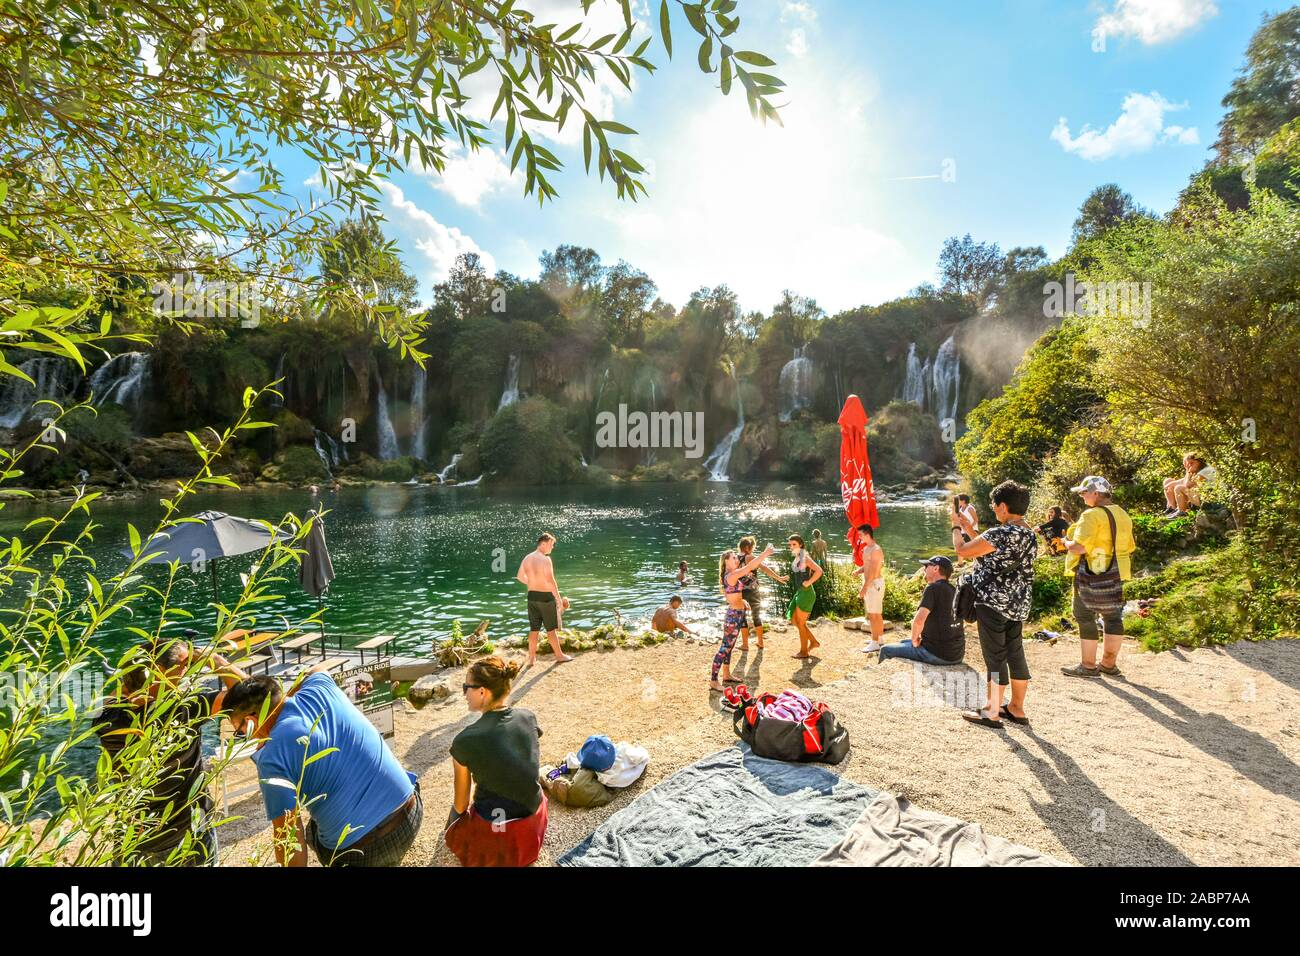 Local Bosnian families enjoy a day at the sandy beach at Kravica Falls near Mostar, Bosnia and Herzegovina. Stock Photo